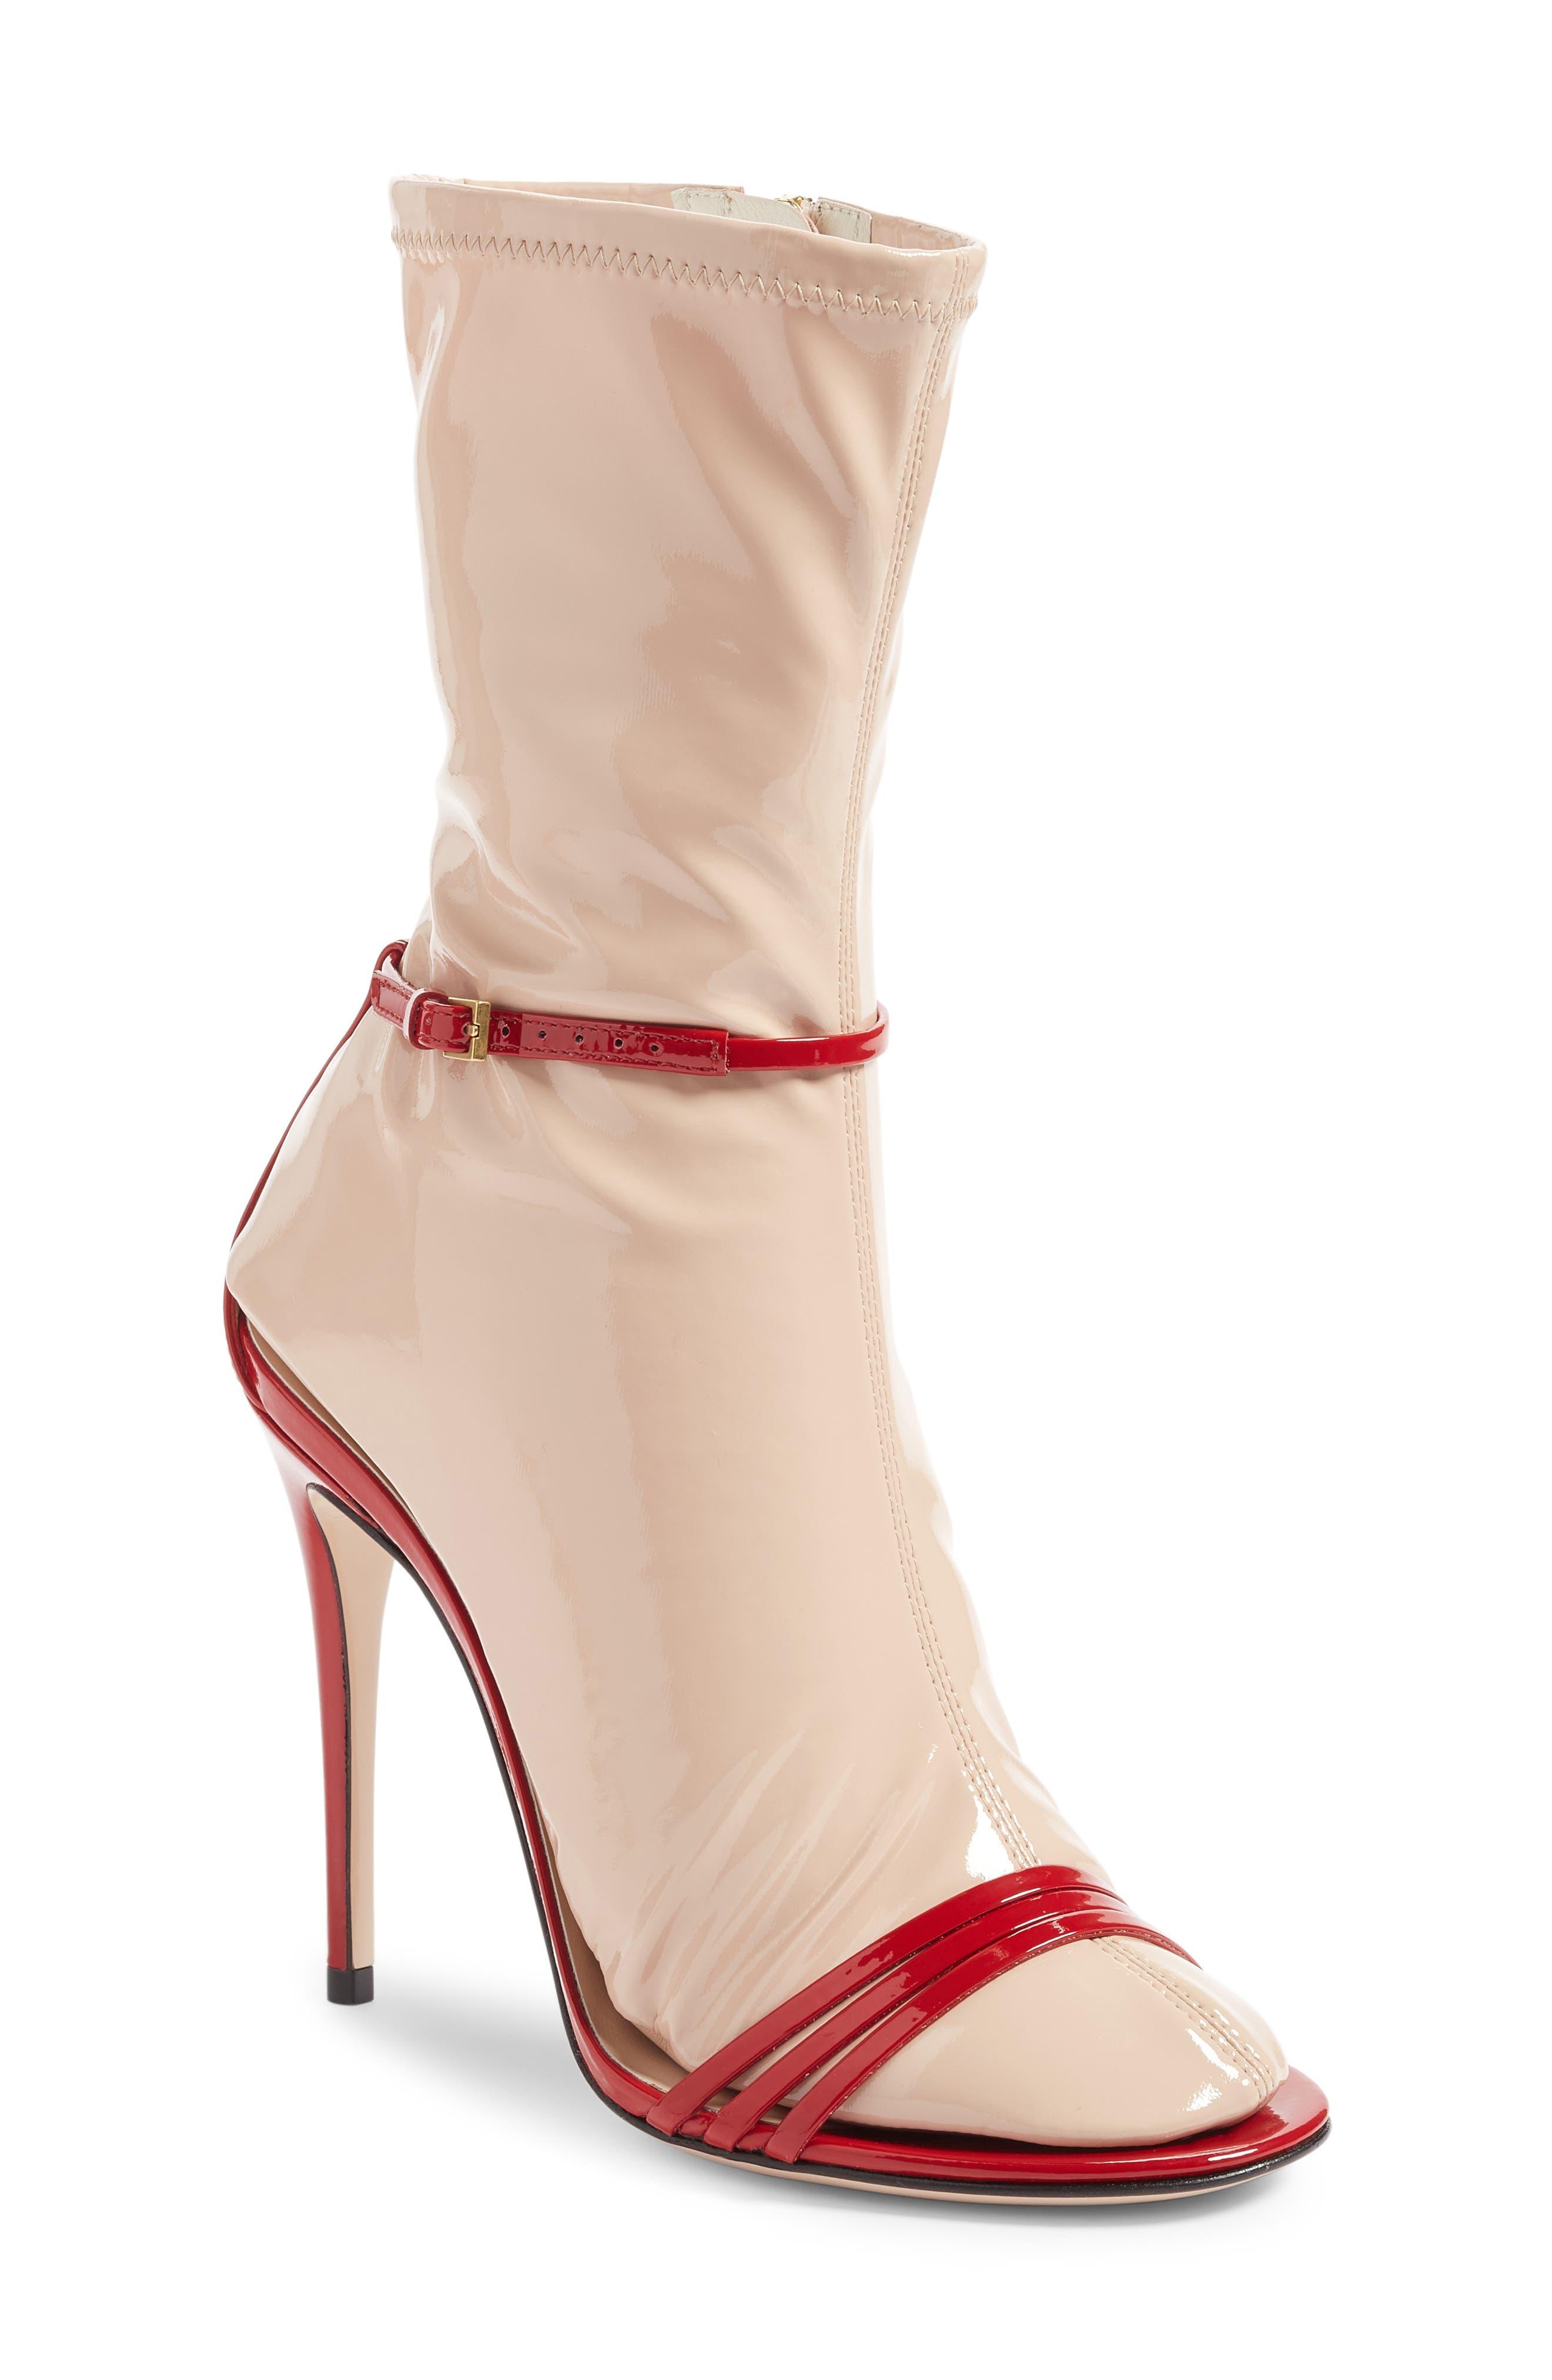 GUCCI, Ilse Sock Sandal, Main thumbnail 1, color, 600